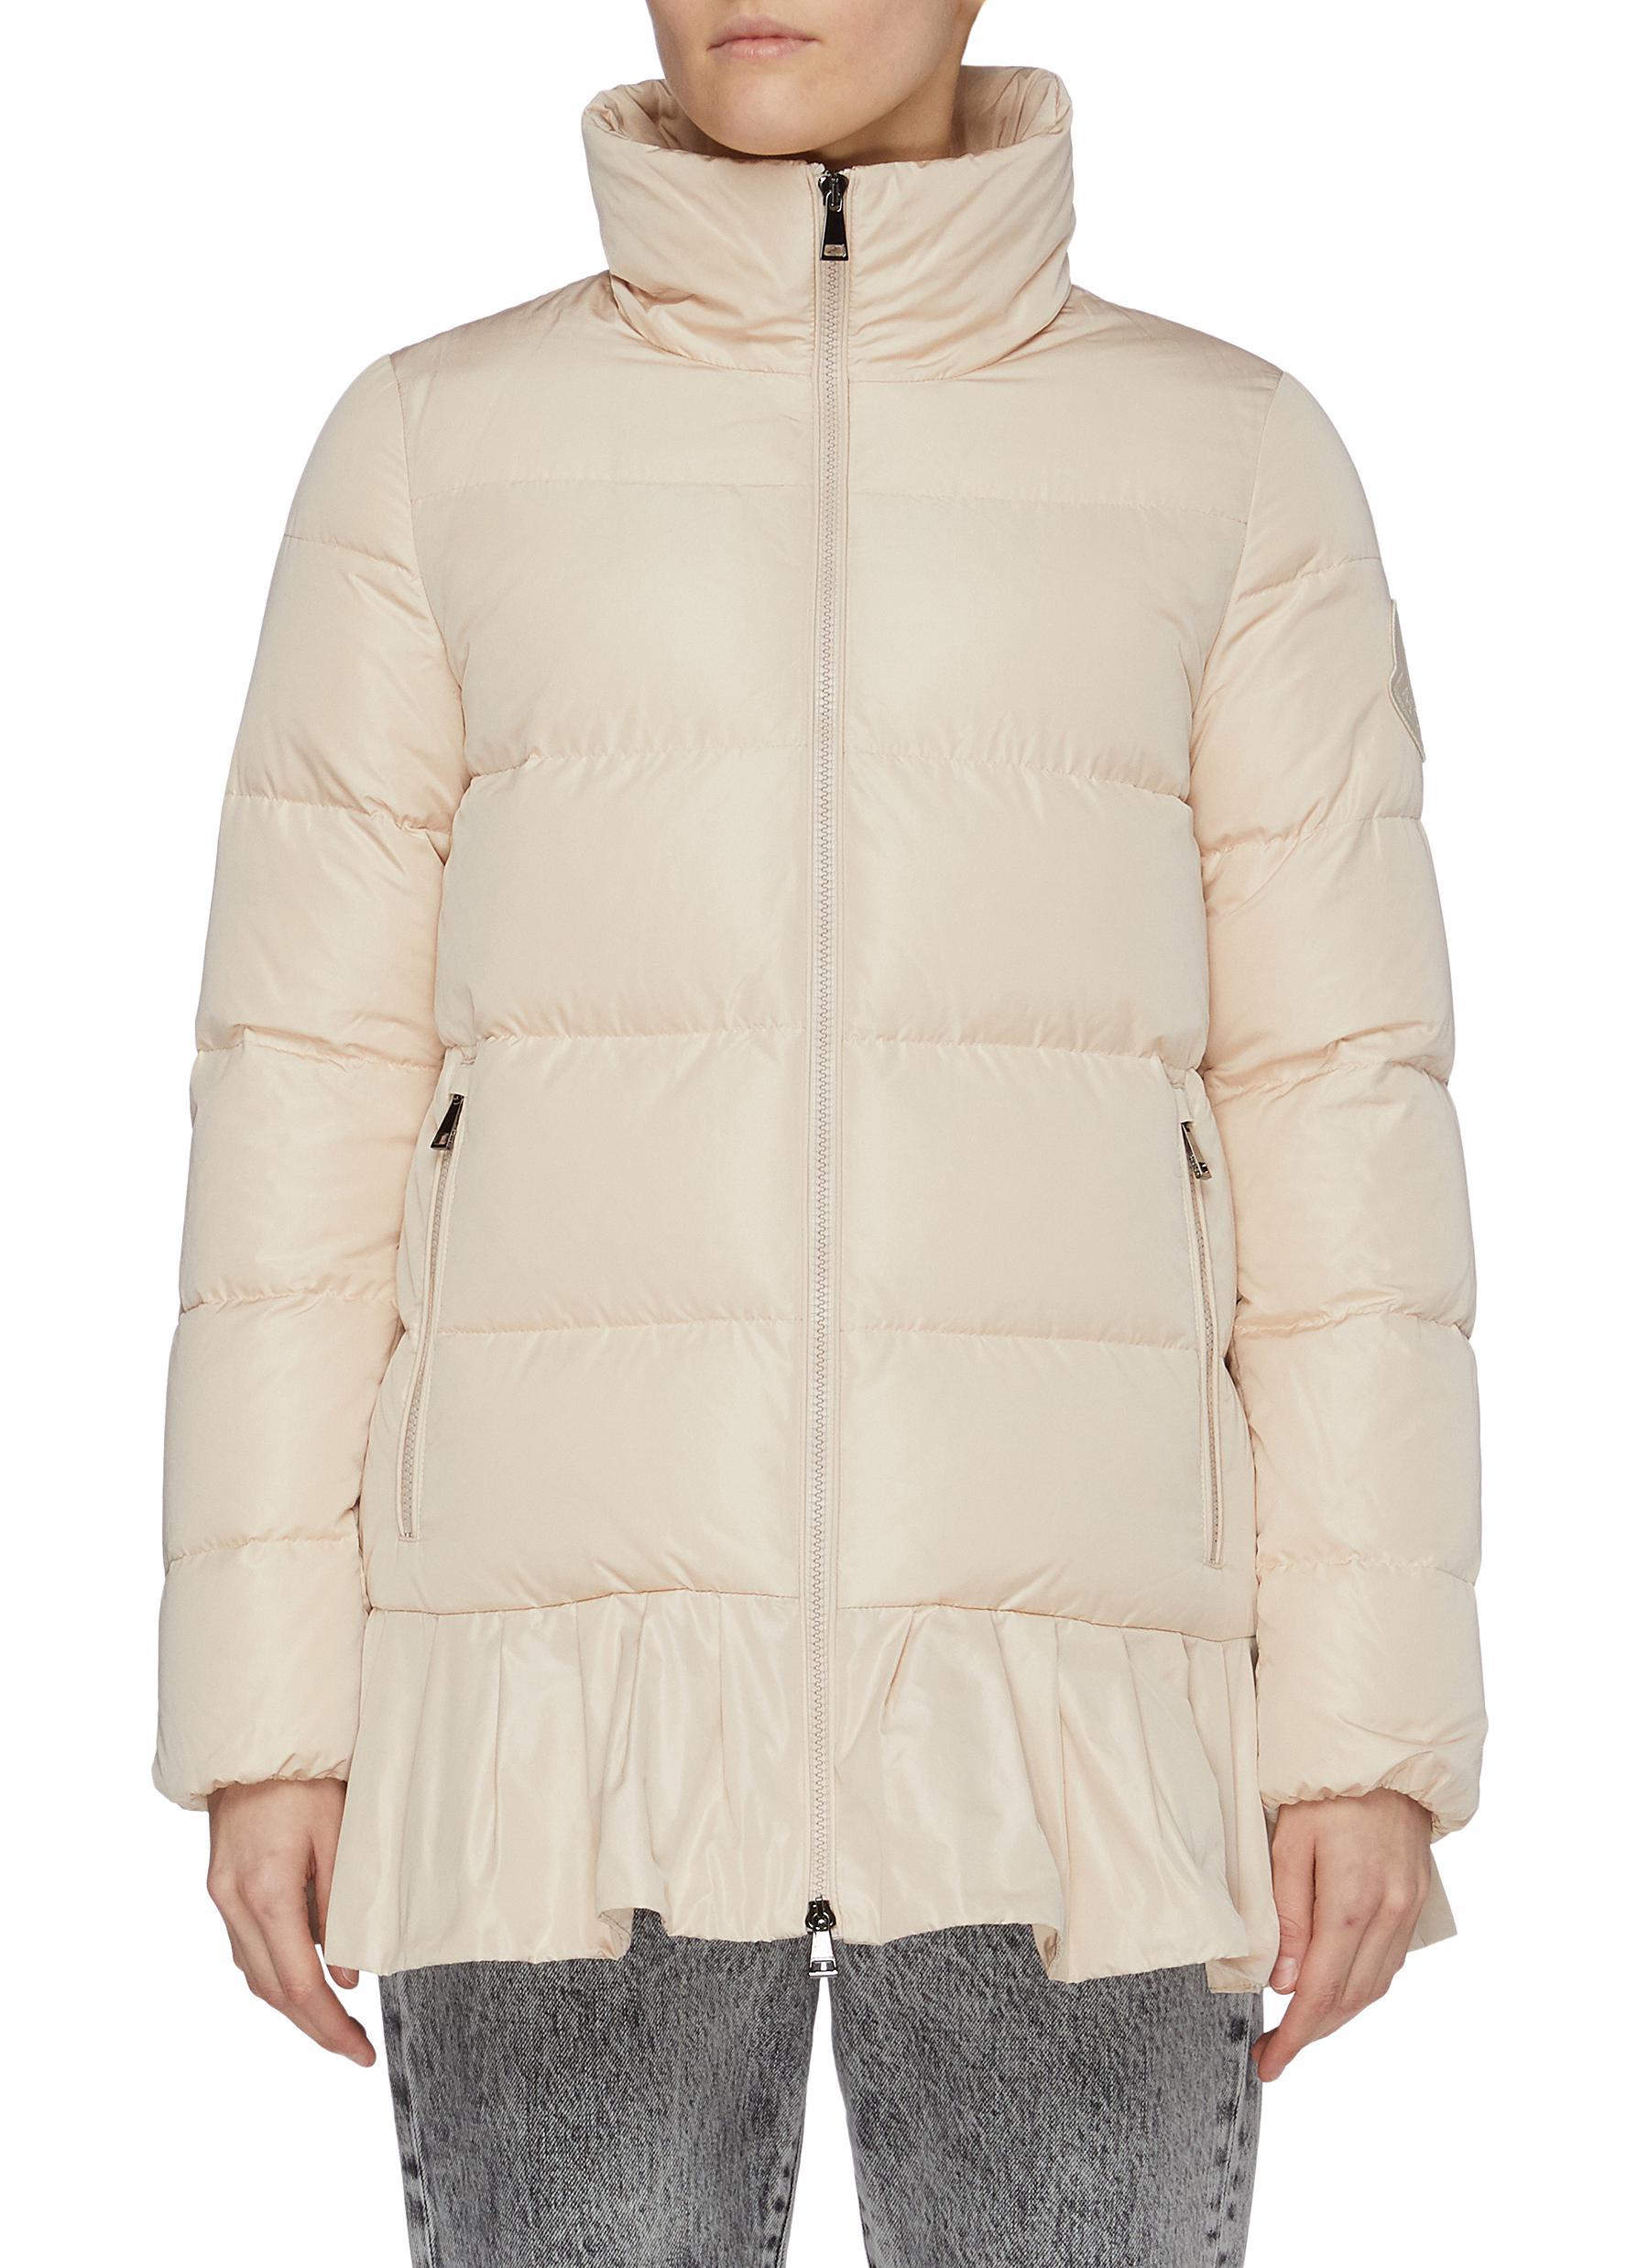 'Brunec' mock neck skirt hem puffer jacket